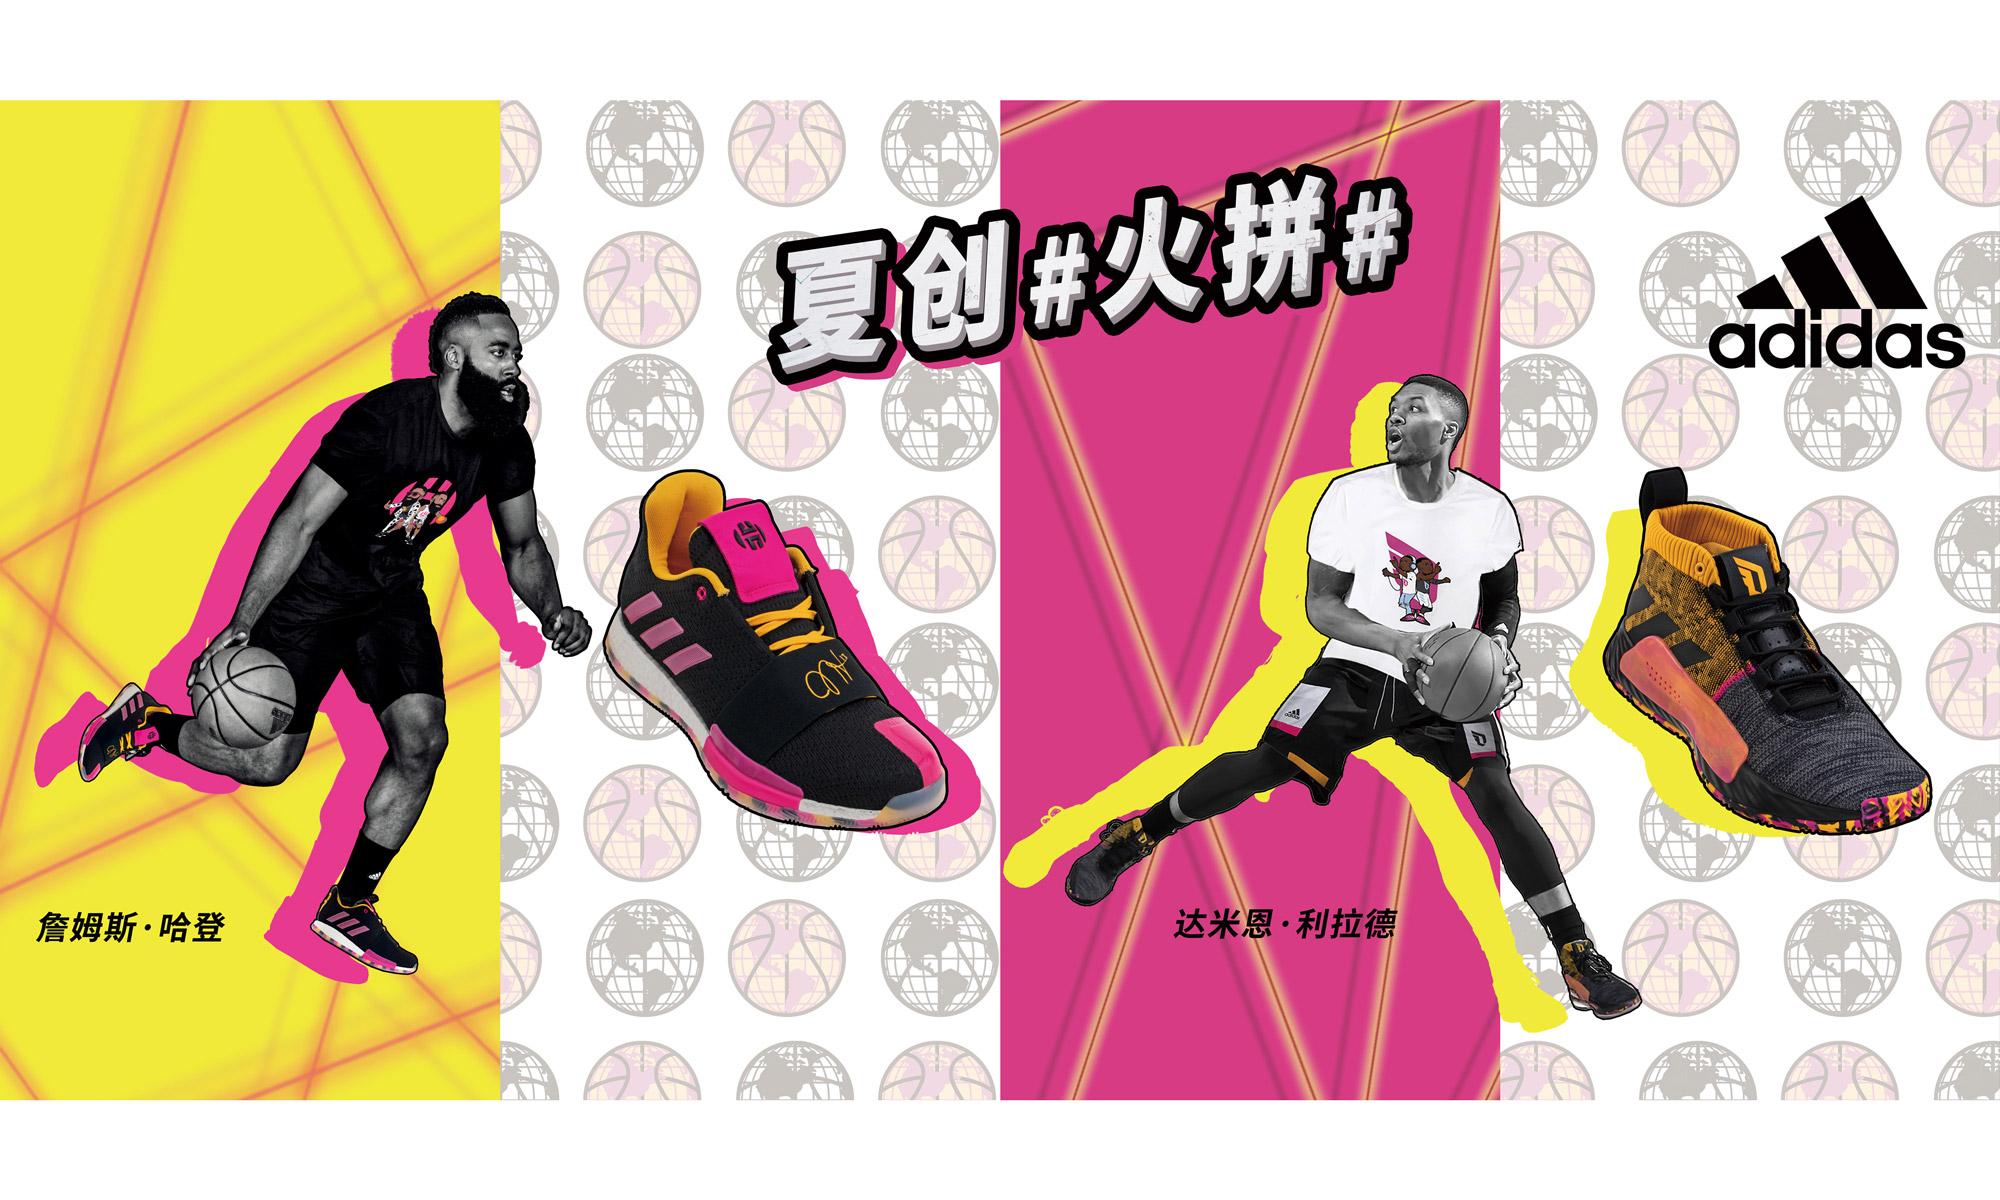 夏创火拼!adidas basketball 发布 2019 Summer Pack 系列装备